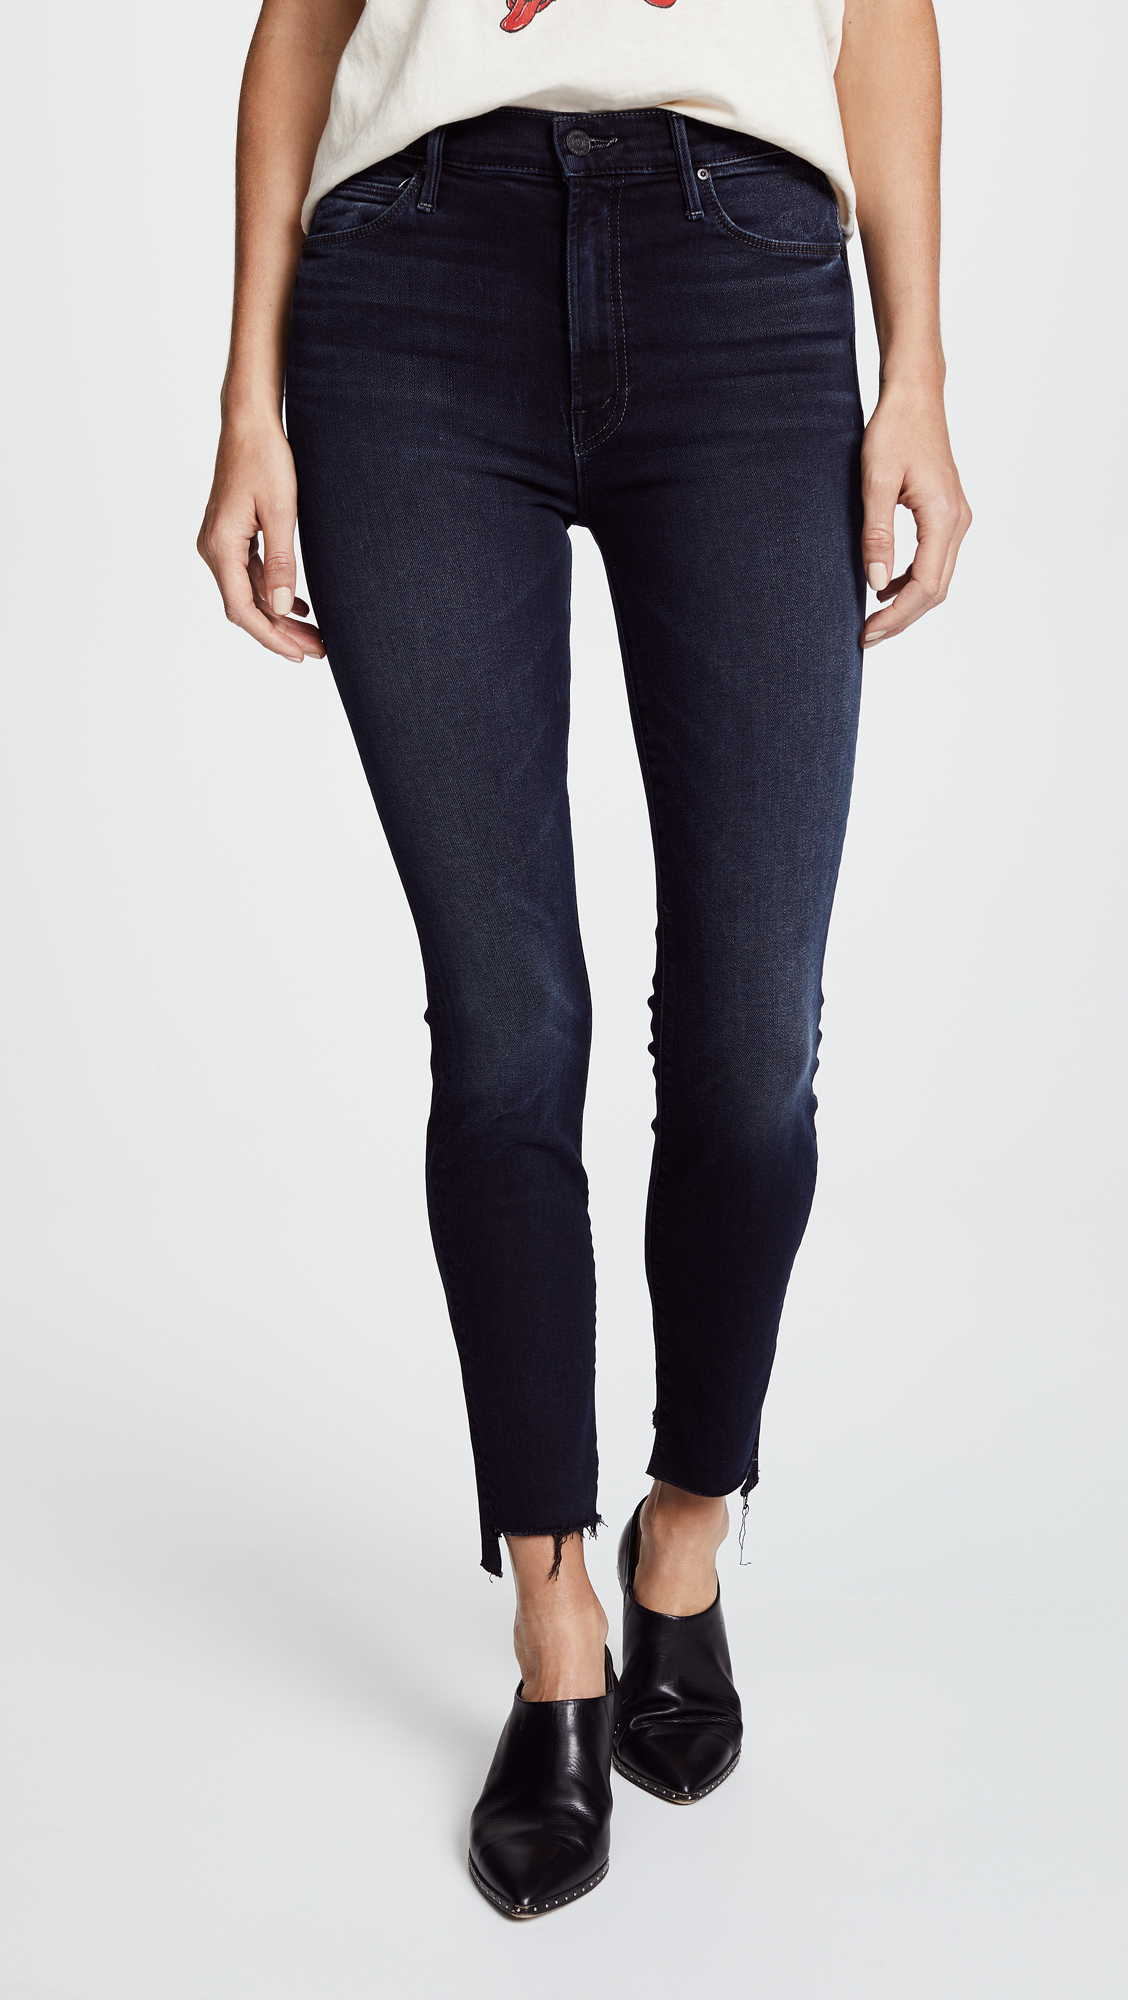 e09a2d436e391 Womens Skinny Jeans